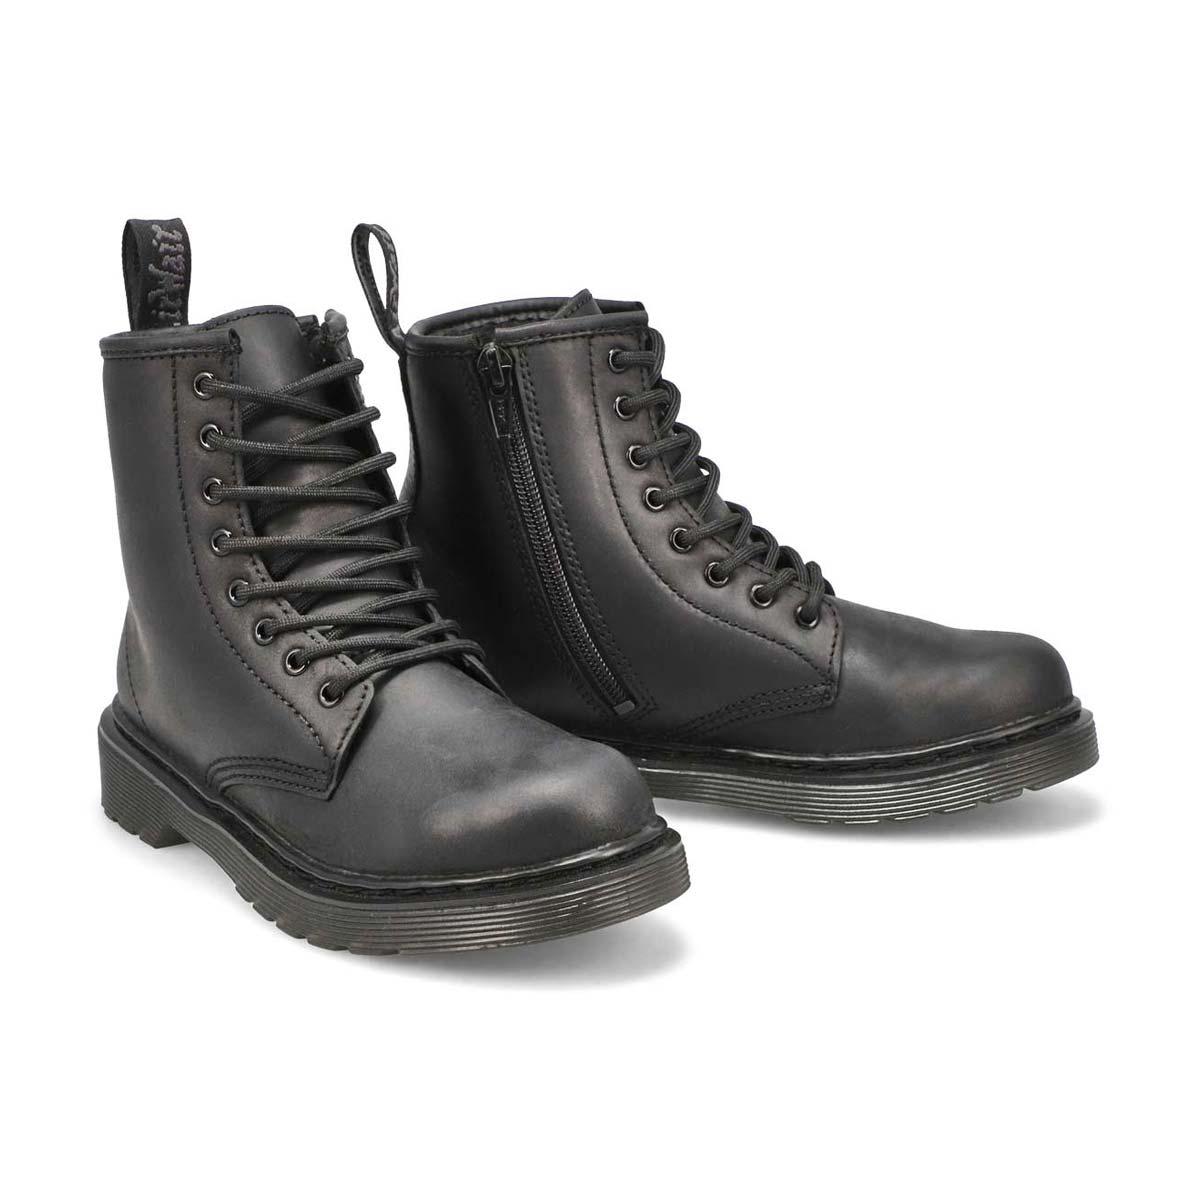 Kds 1460 SerenaMonoJr 8-eye casual boot